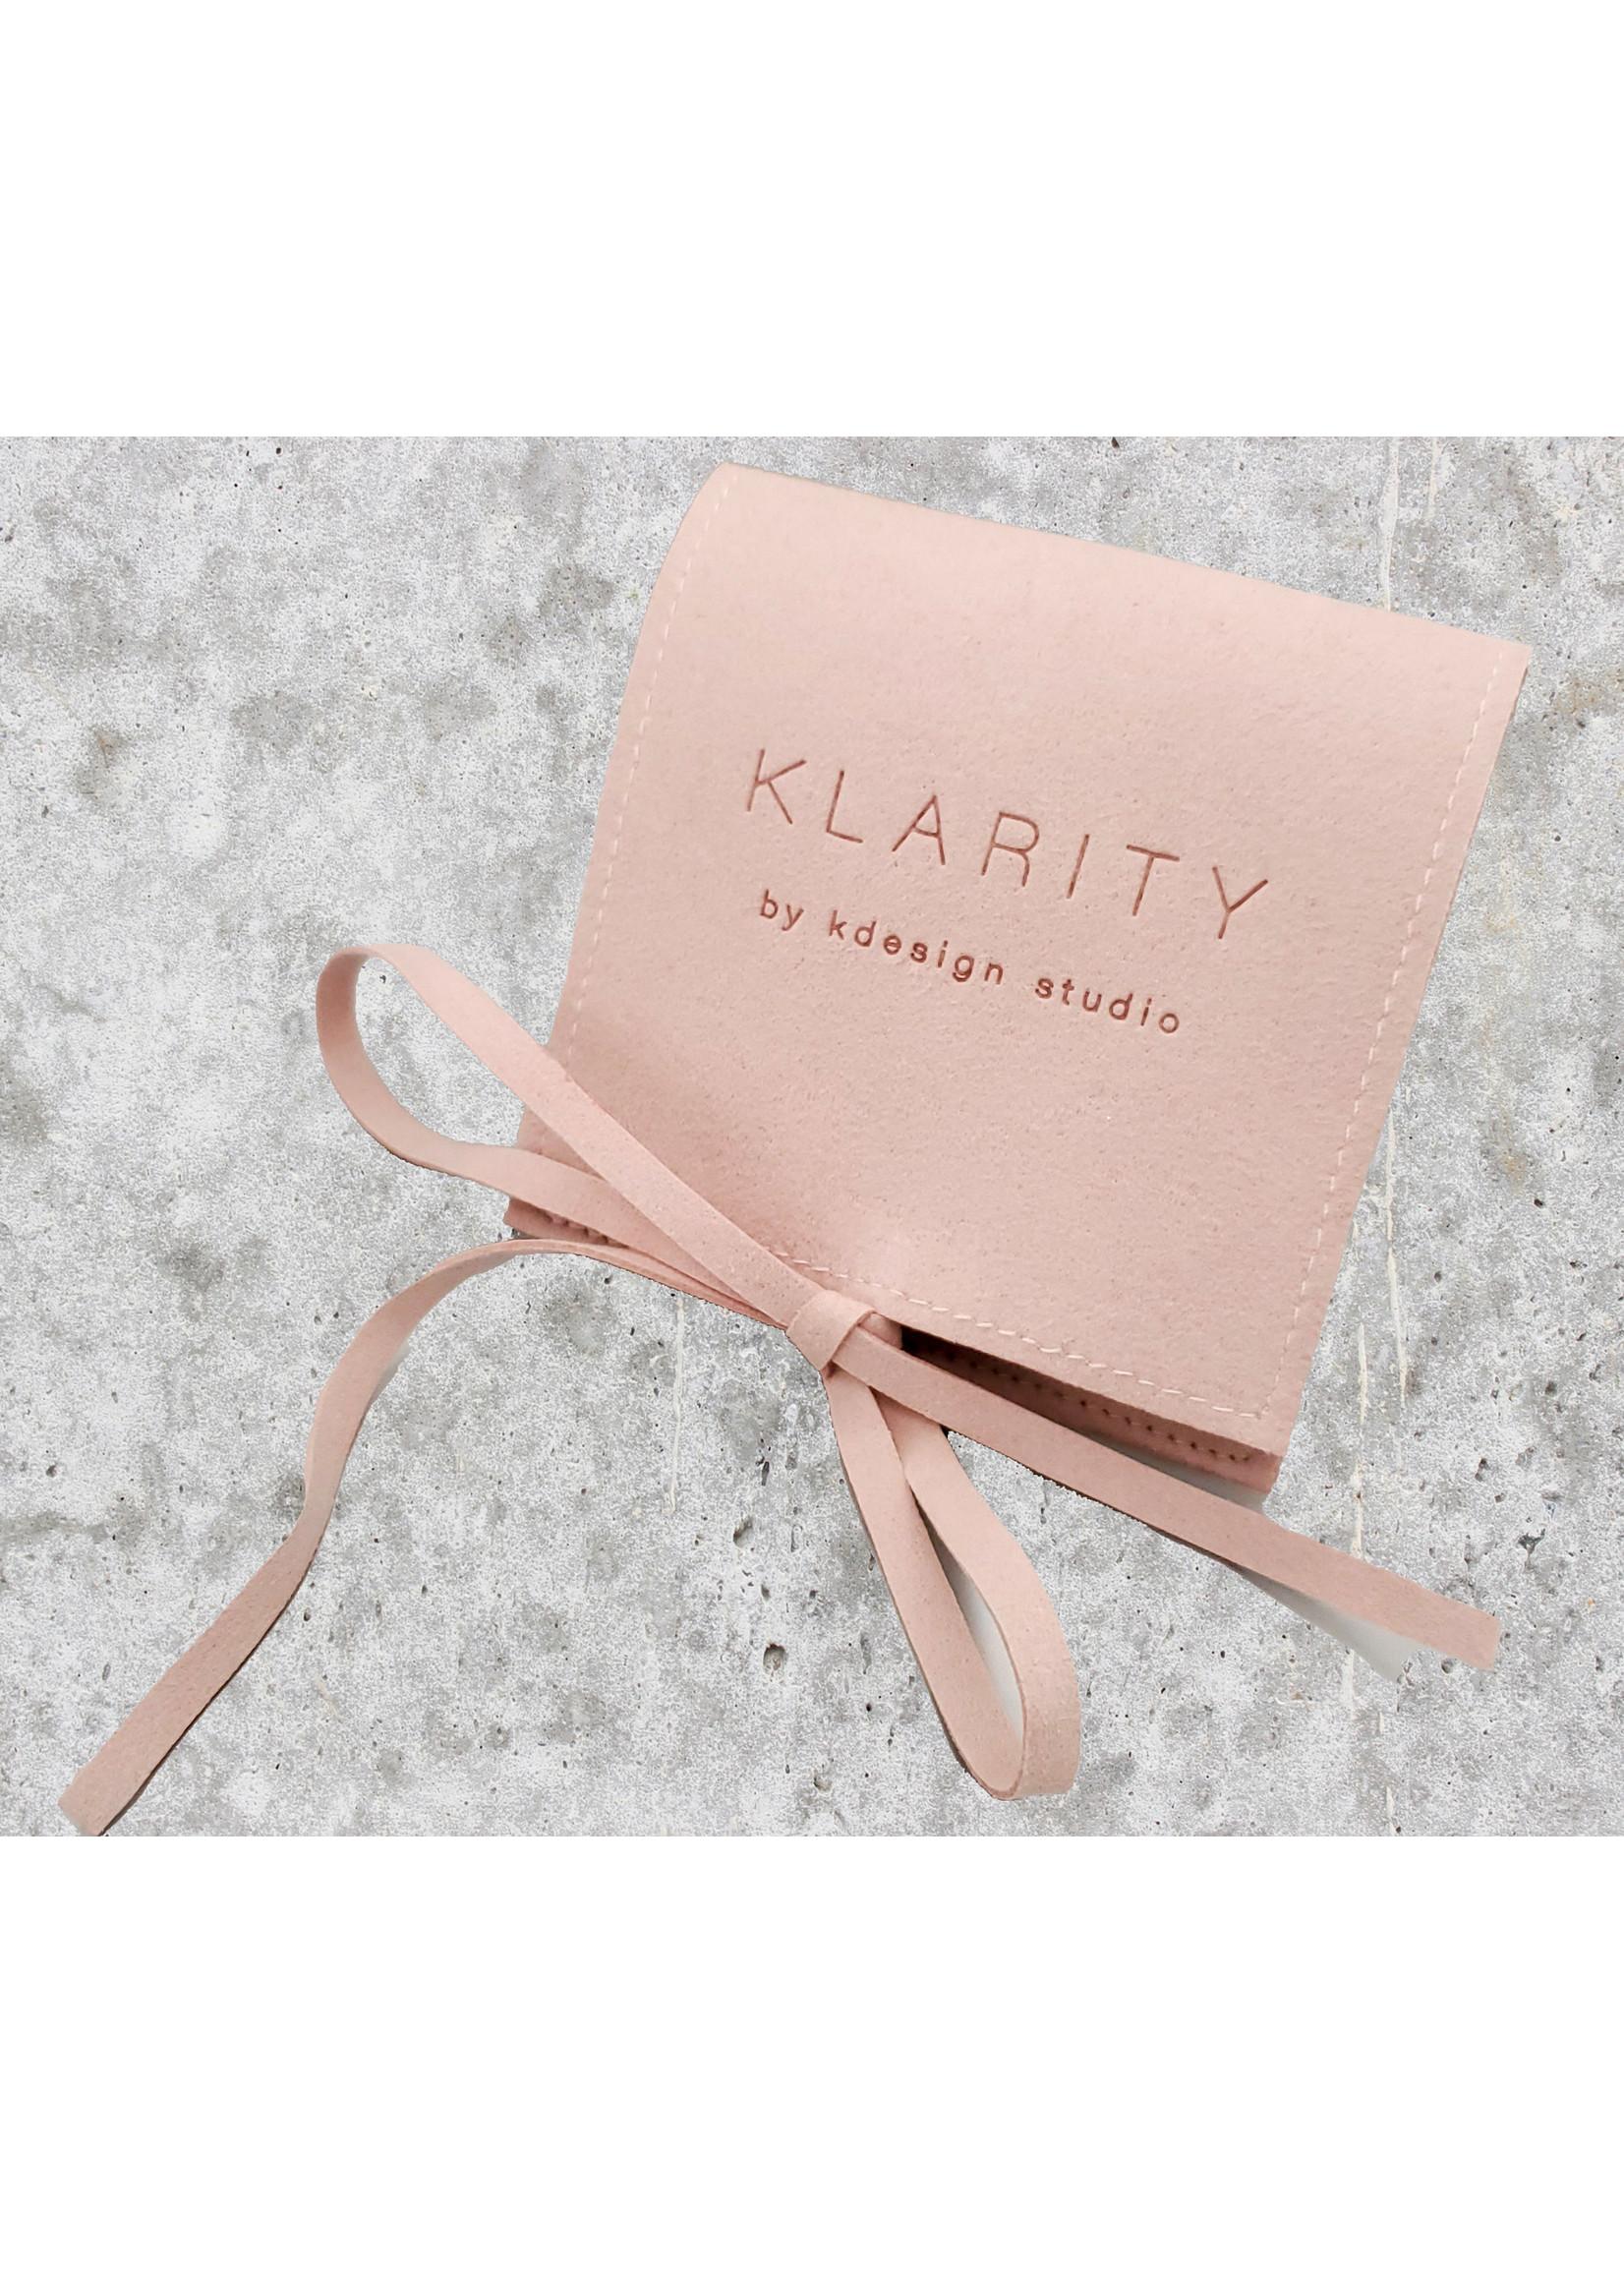 KDesign Studio Klarity Earrings